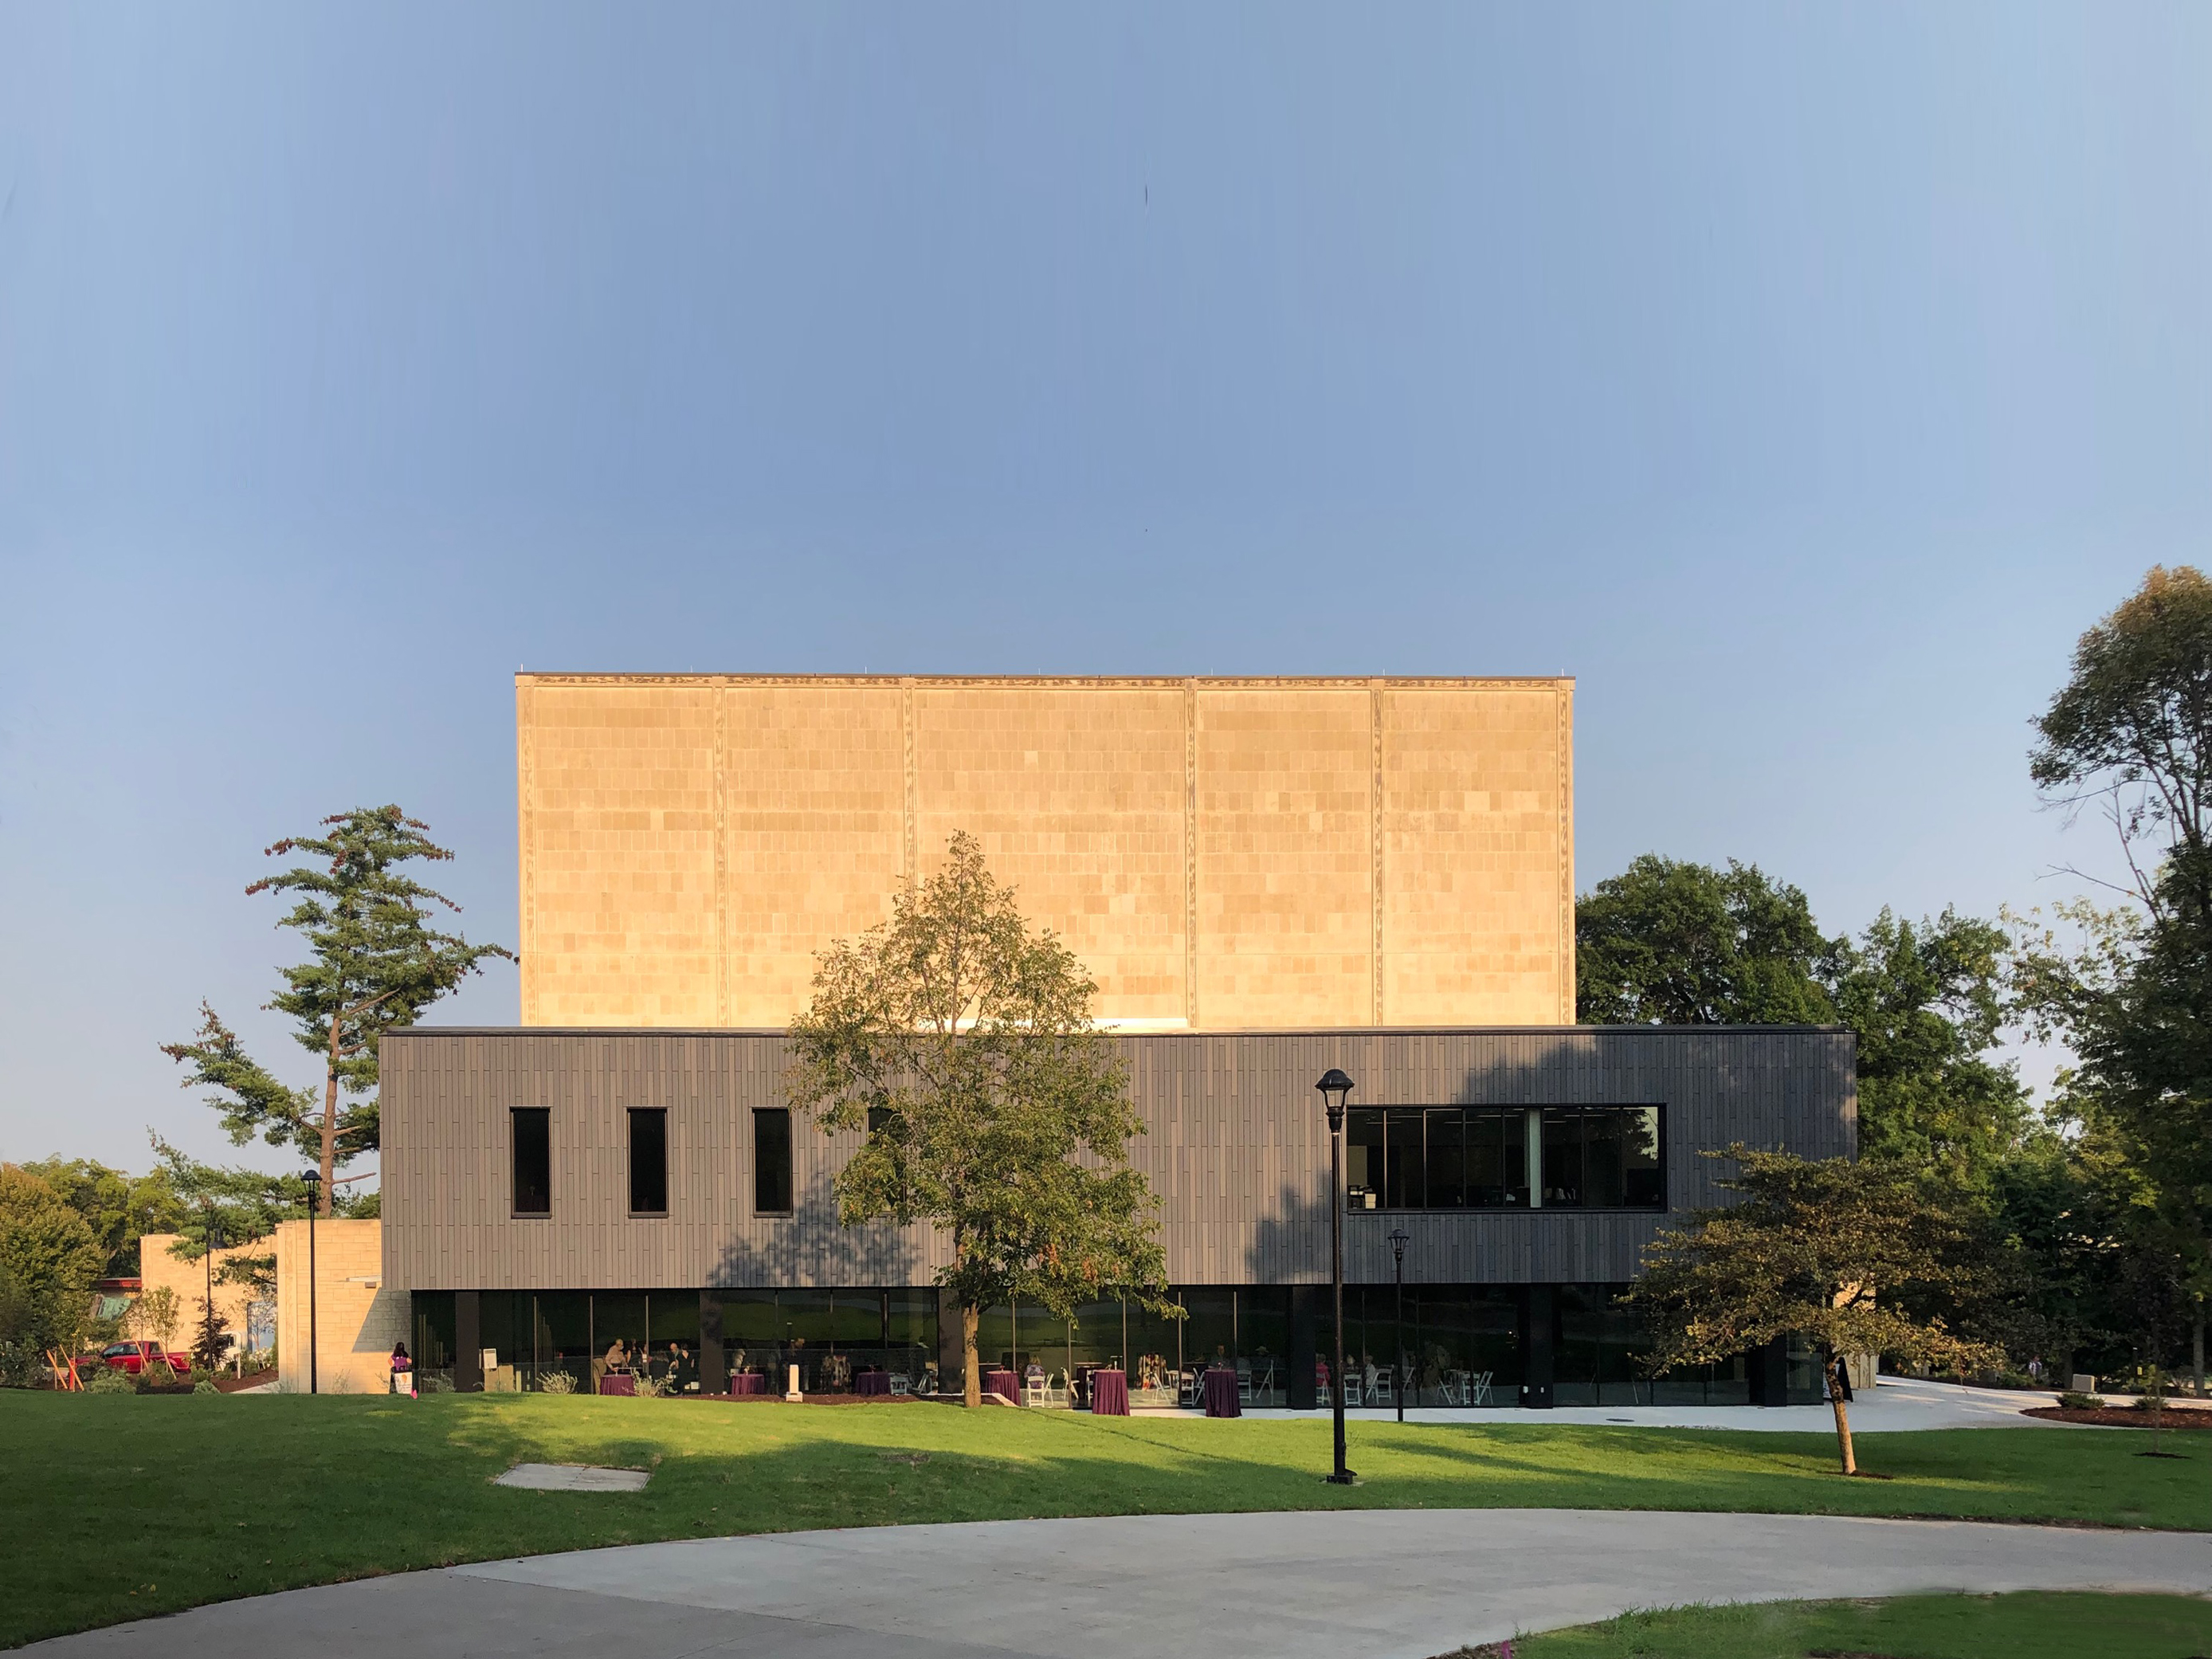 McCain Auditorium at Kansas State University Opens